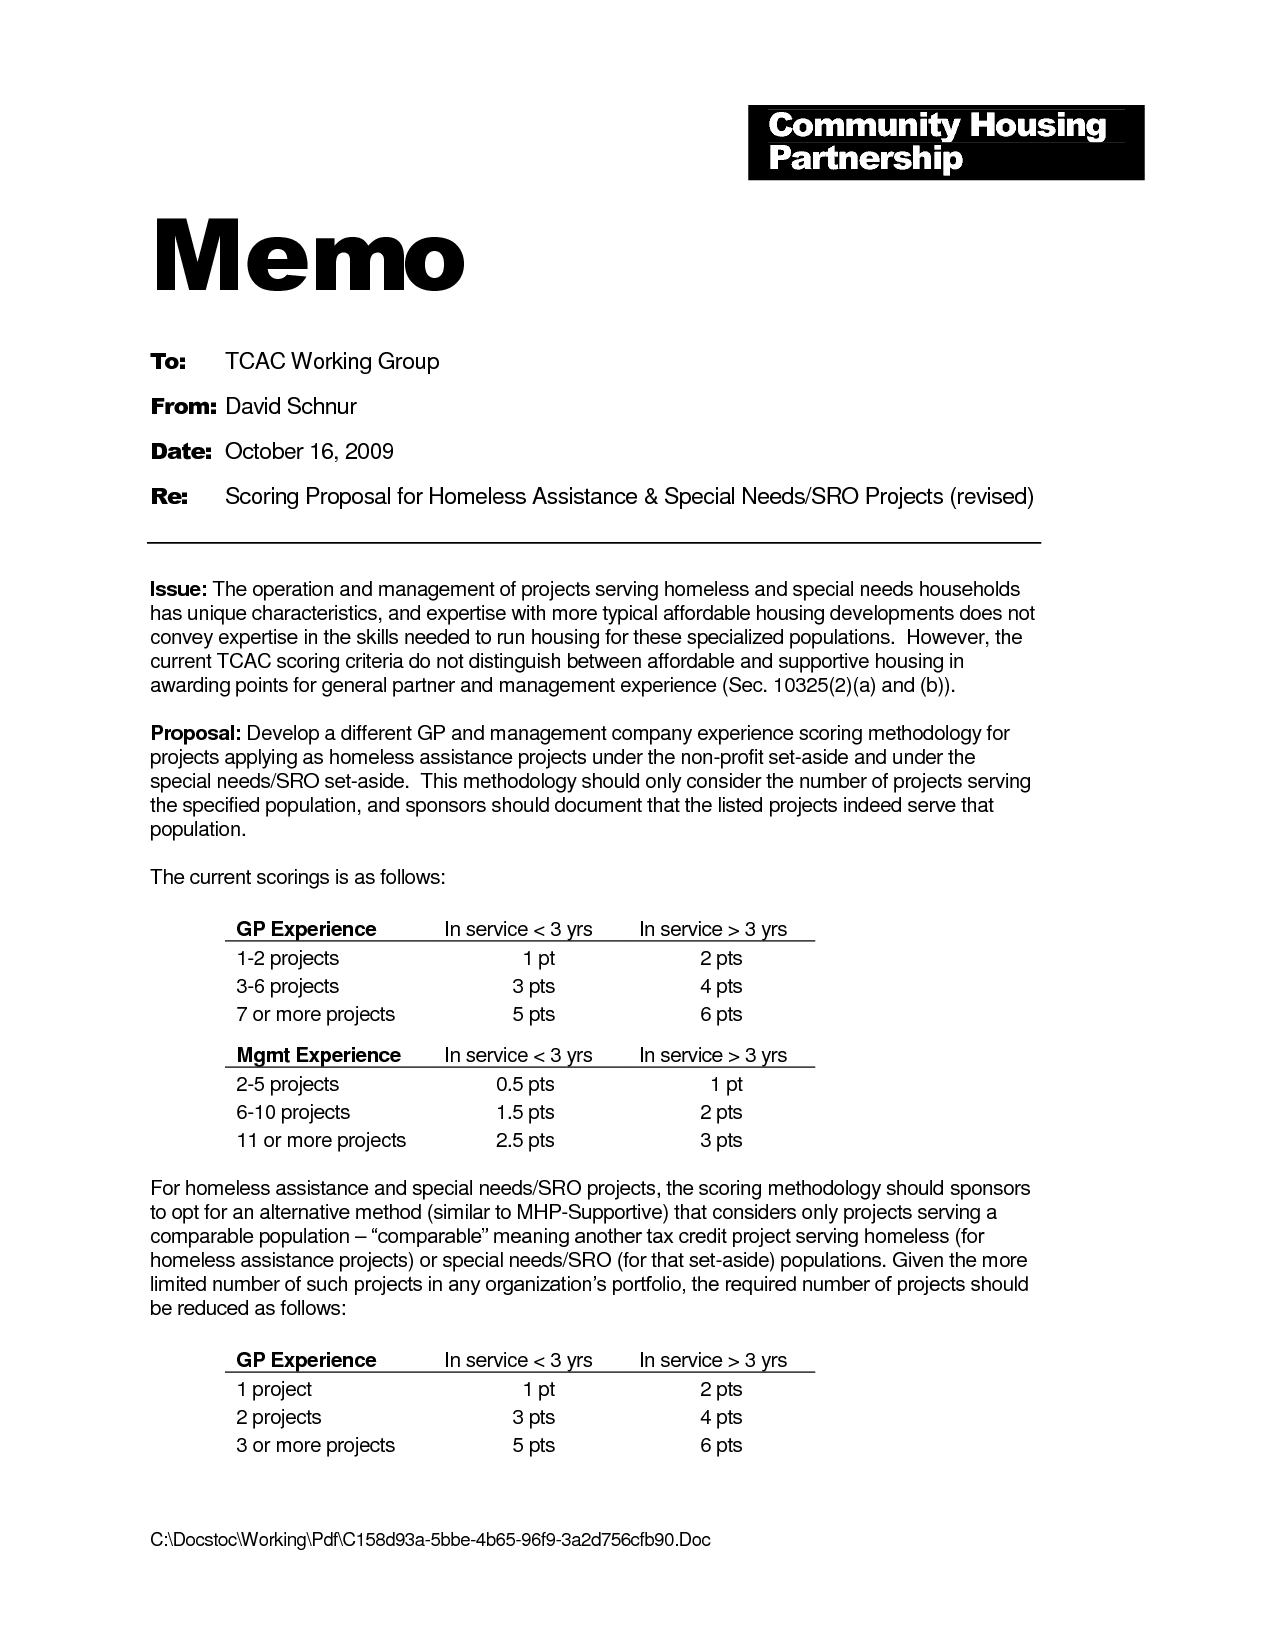 Research proposal memo format